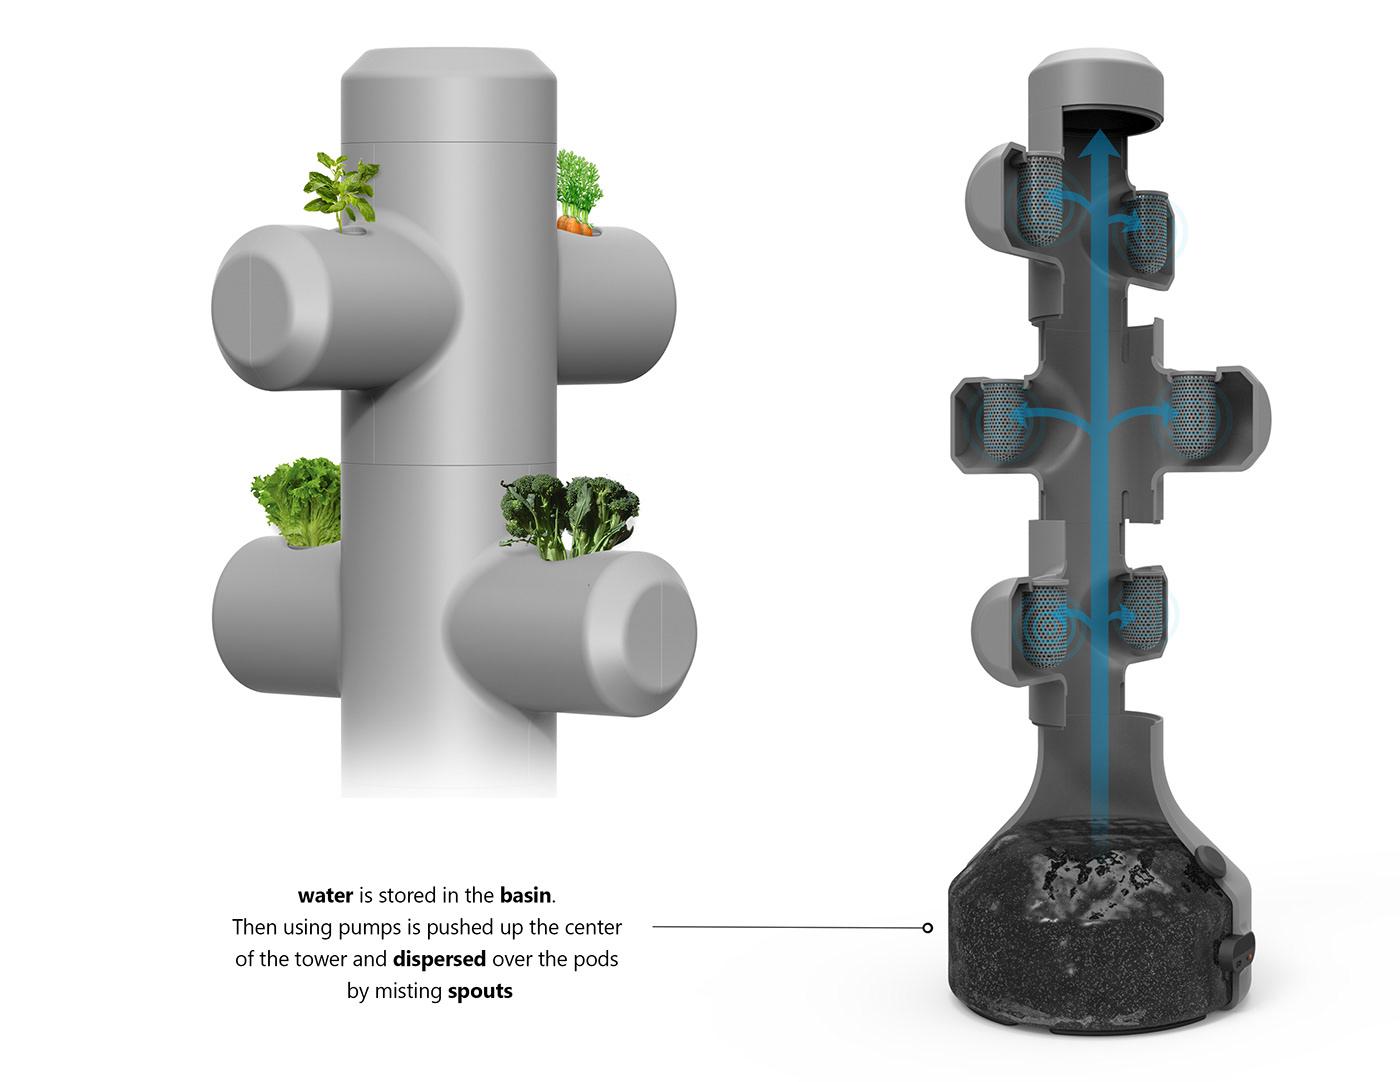 modular kitchen products